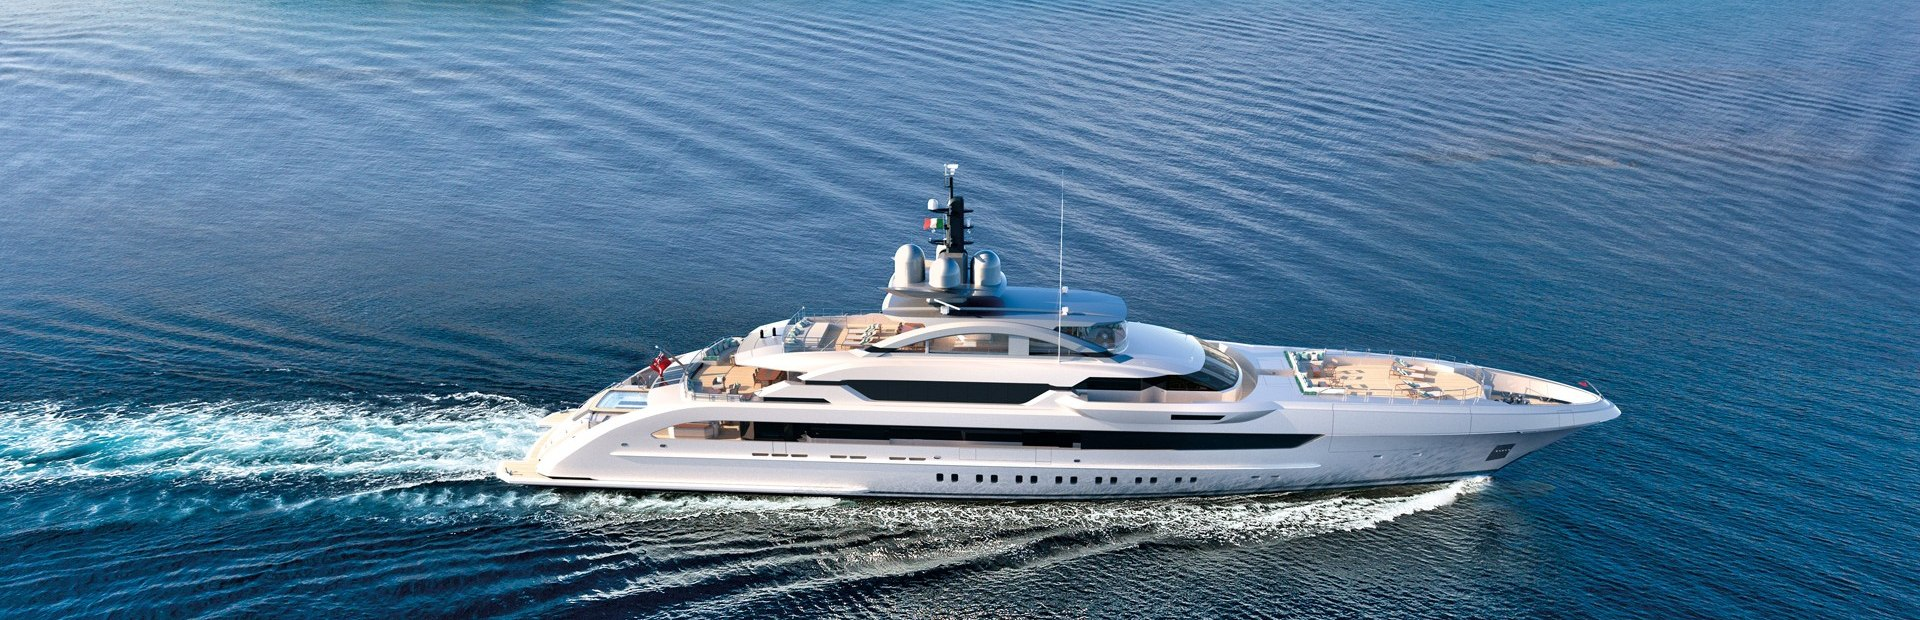 7000 Aluminium Yacht Charter